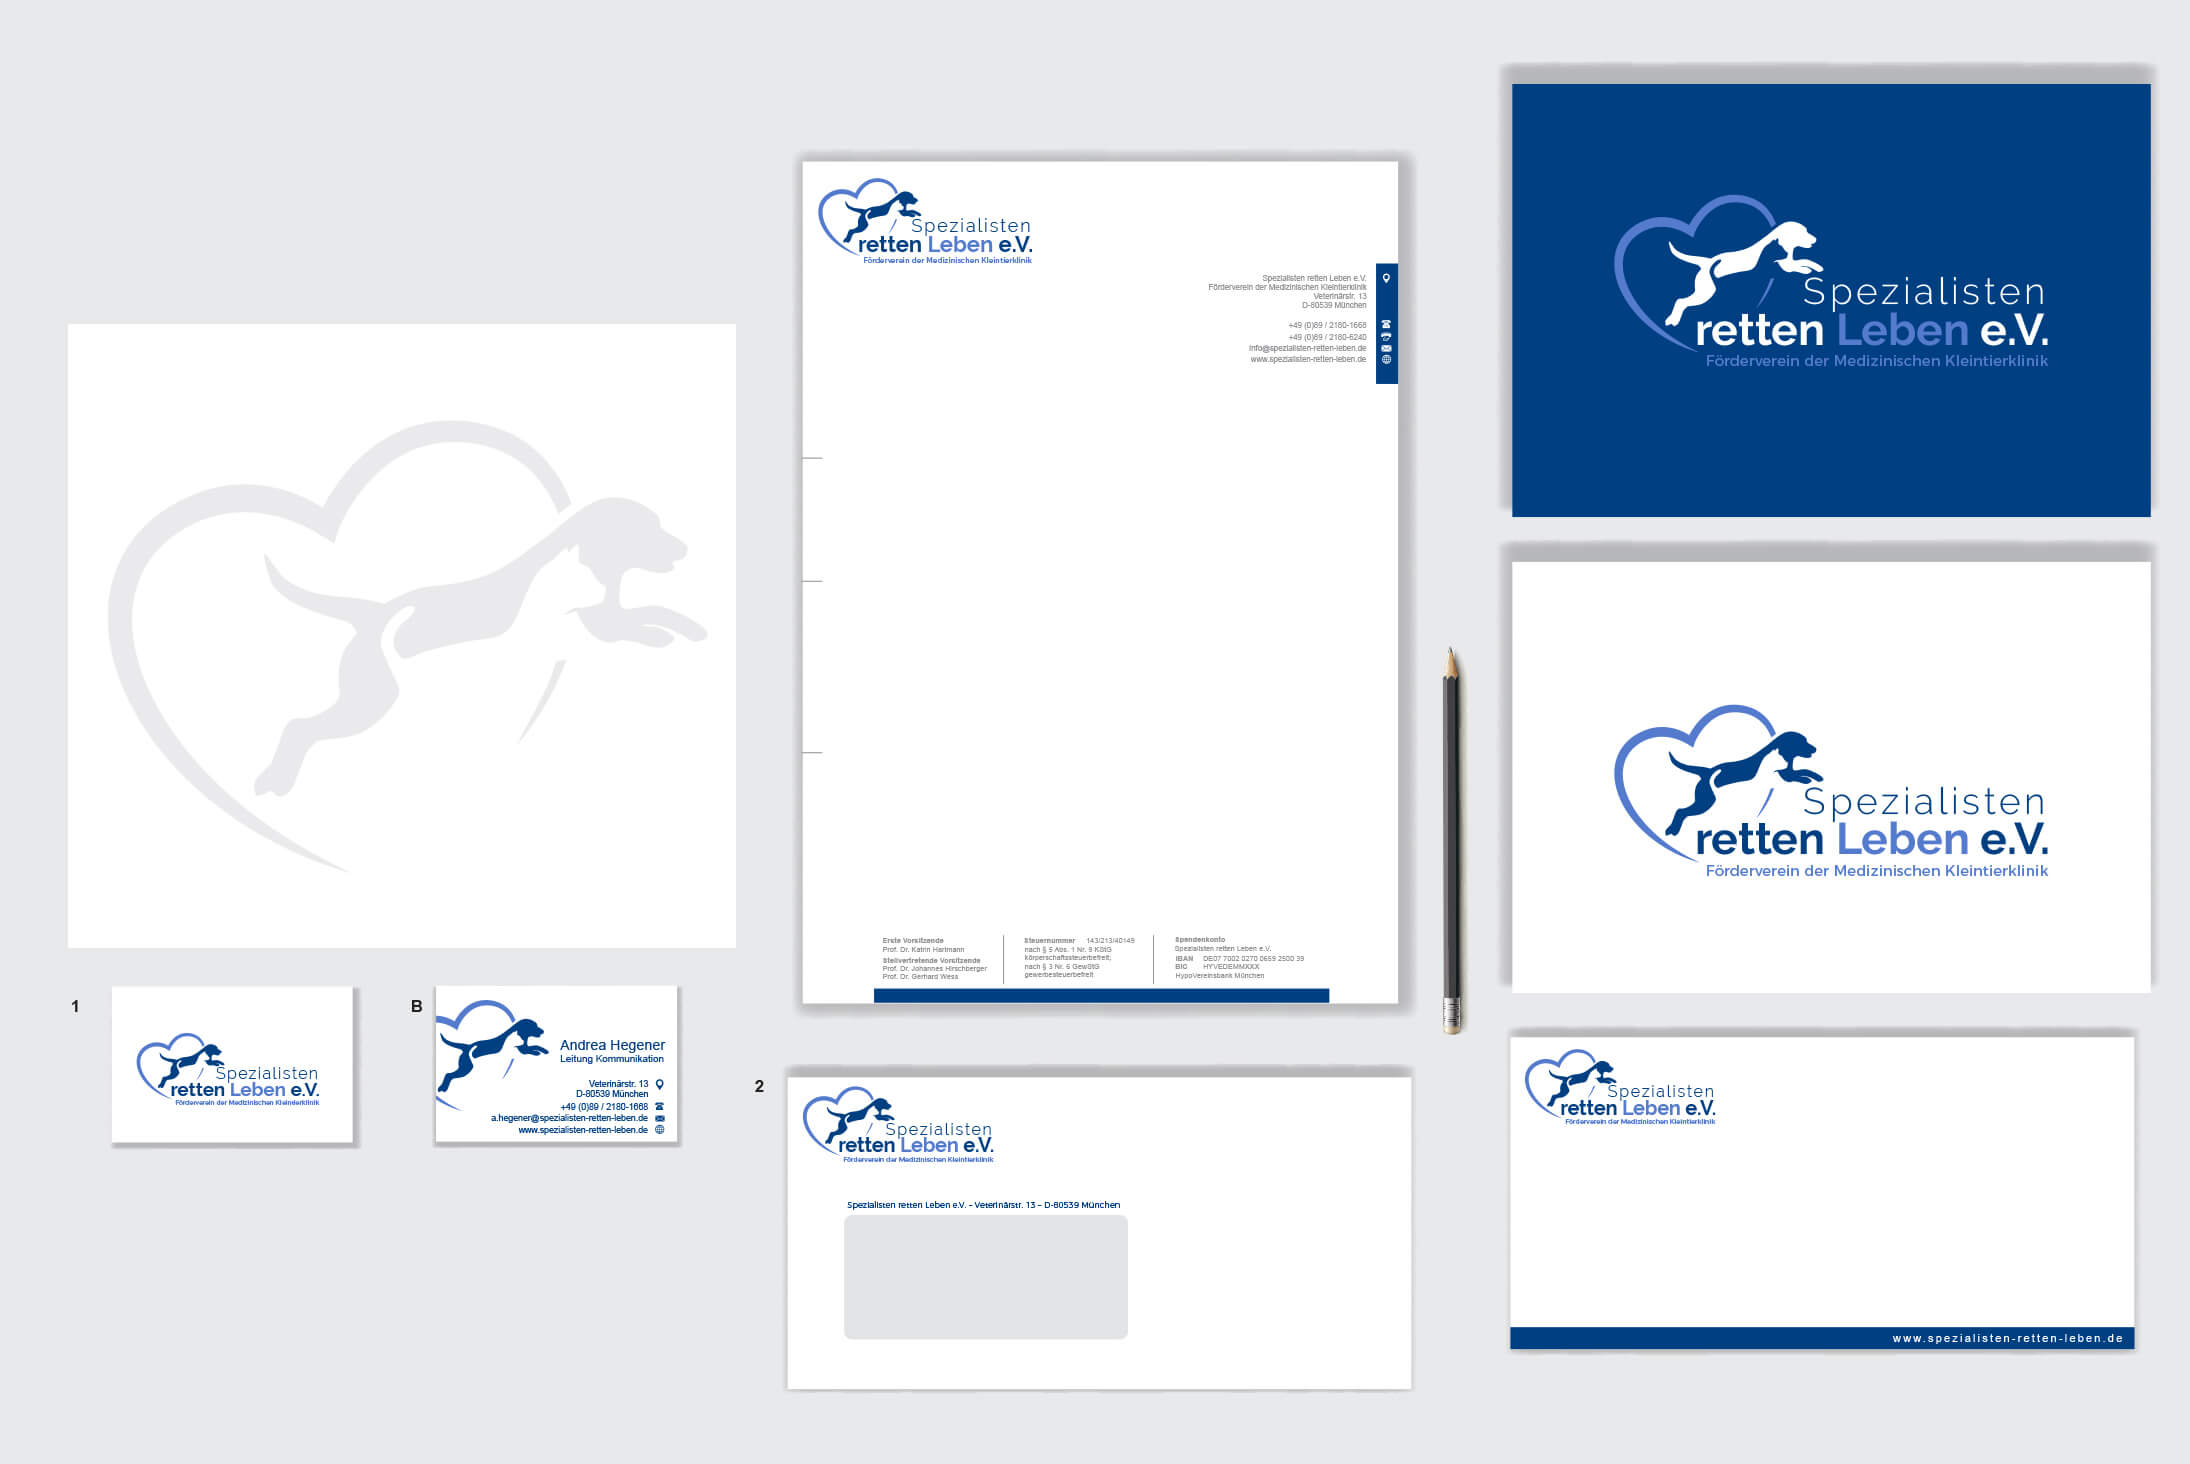 Logo Förderverein medizinische Kleintierklinik